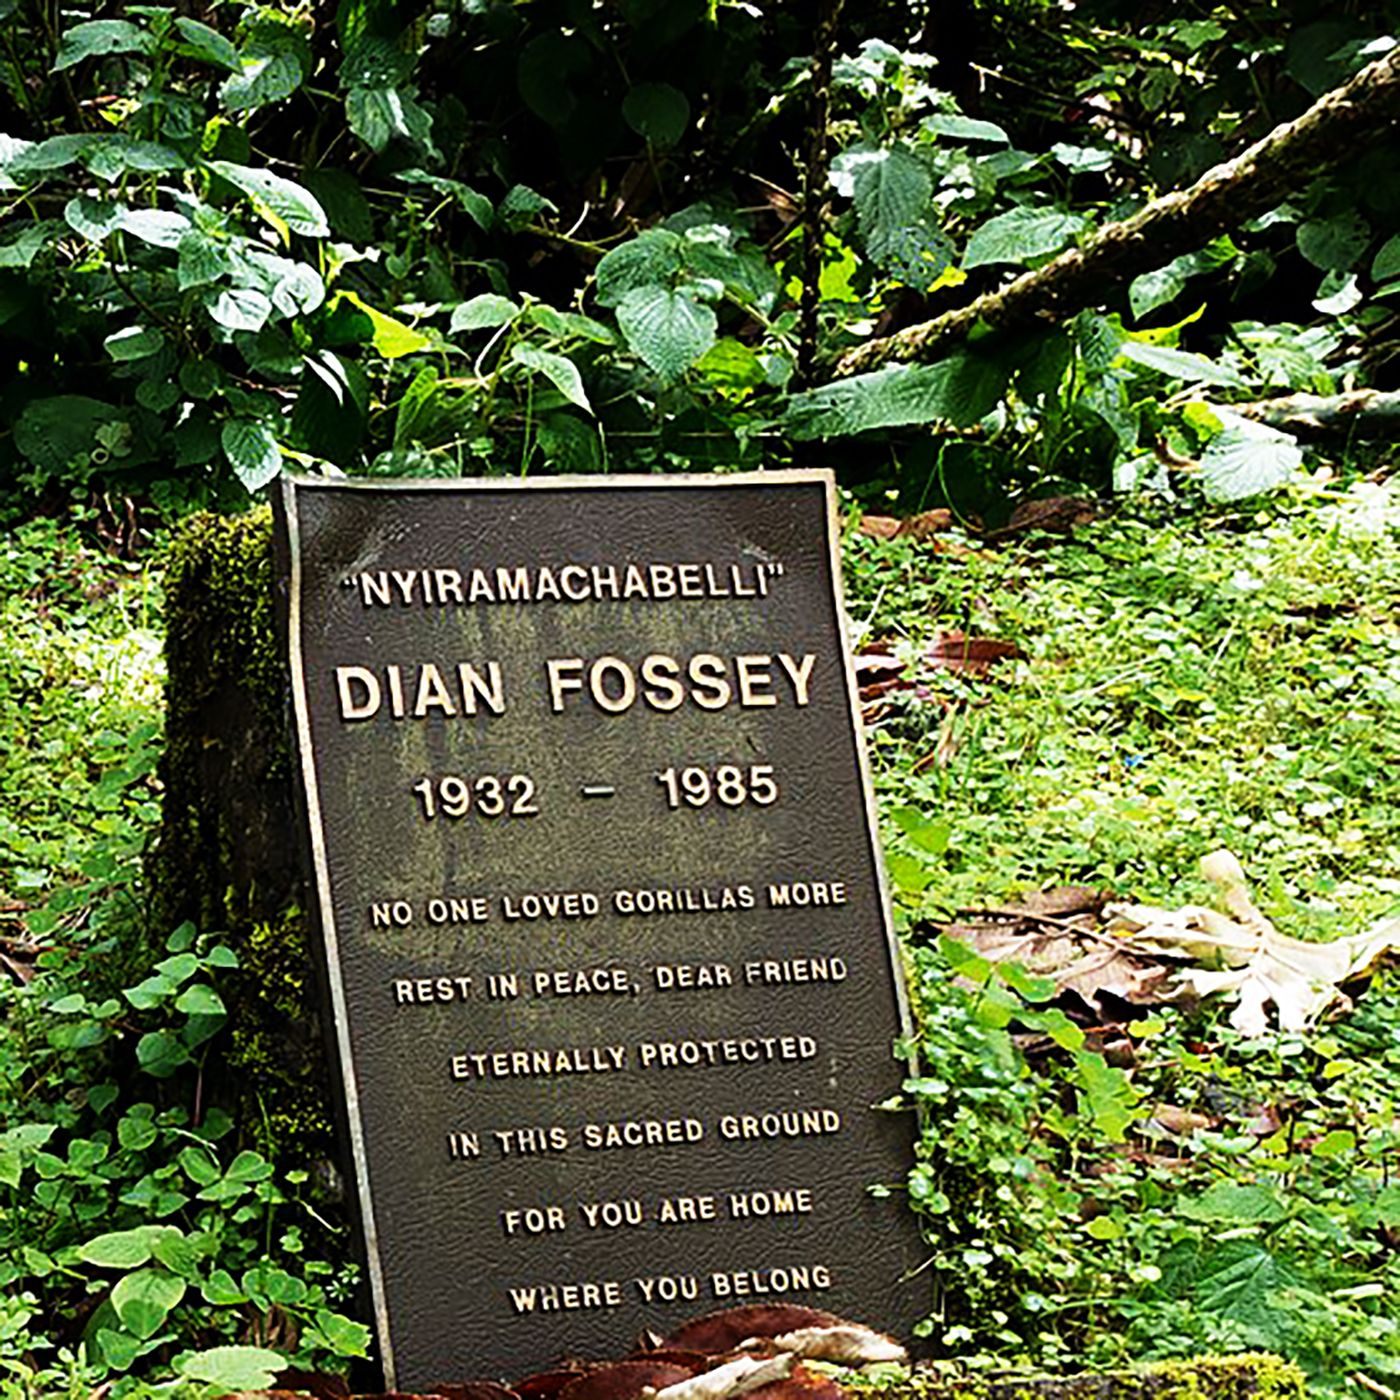 S5E1. Dian Fossey: Til kamp for bjerggorillaerne